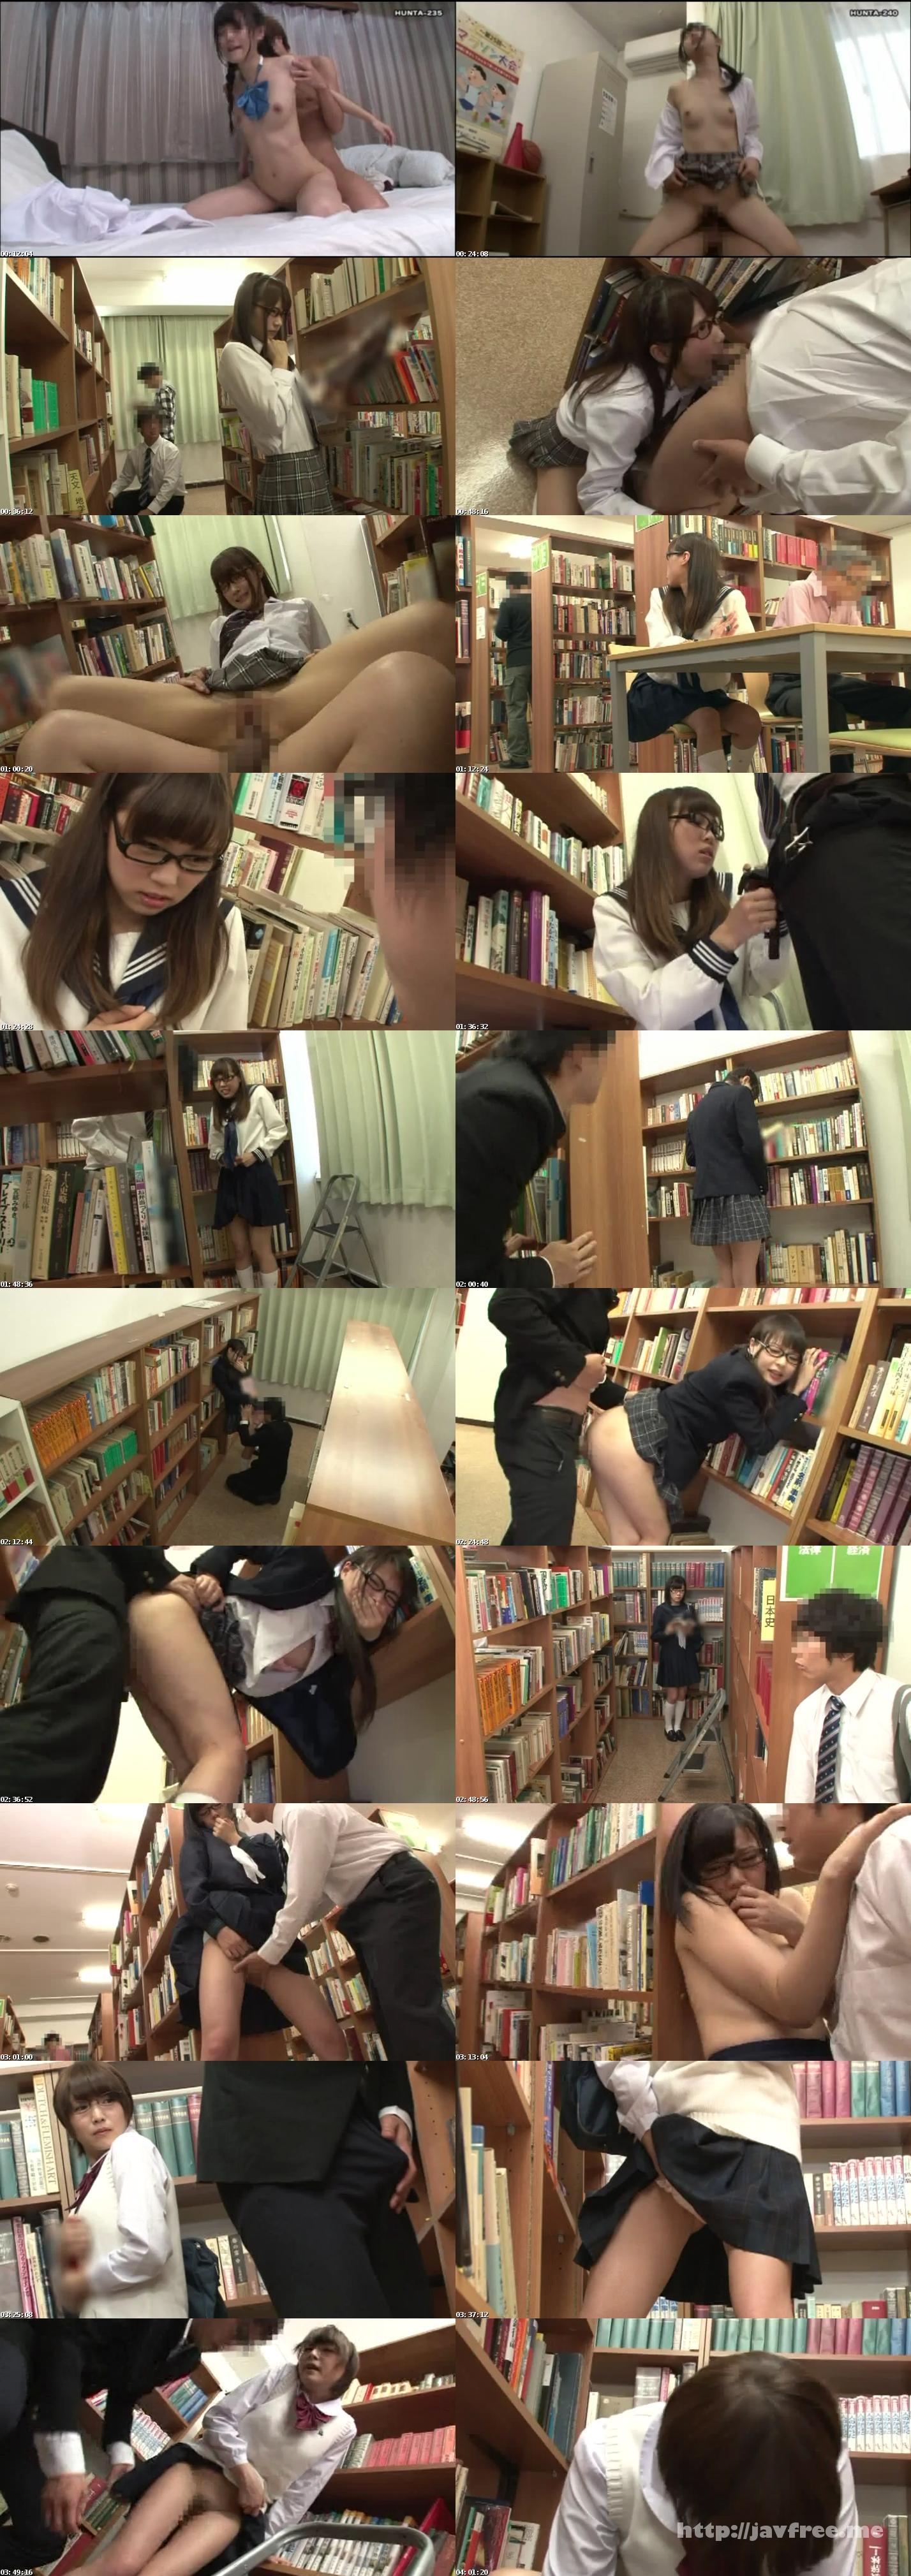 [HUNTA-247] 図書館でちょっとエッチなお宝本発見!ある日、そのお宝本を真面目そうな女子校生が黙々と読んでいた!早く戻さないかなとイライラしながら見ていると、女子はモジモジとし始めてパンツを濡らし興奮状態。その光景から目をそらすことができず見つめていると本棚越しに目が…